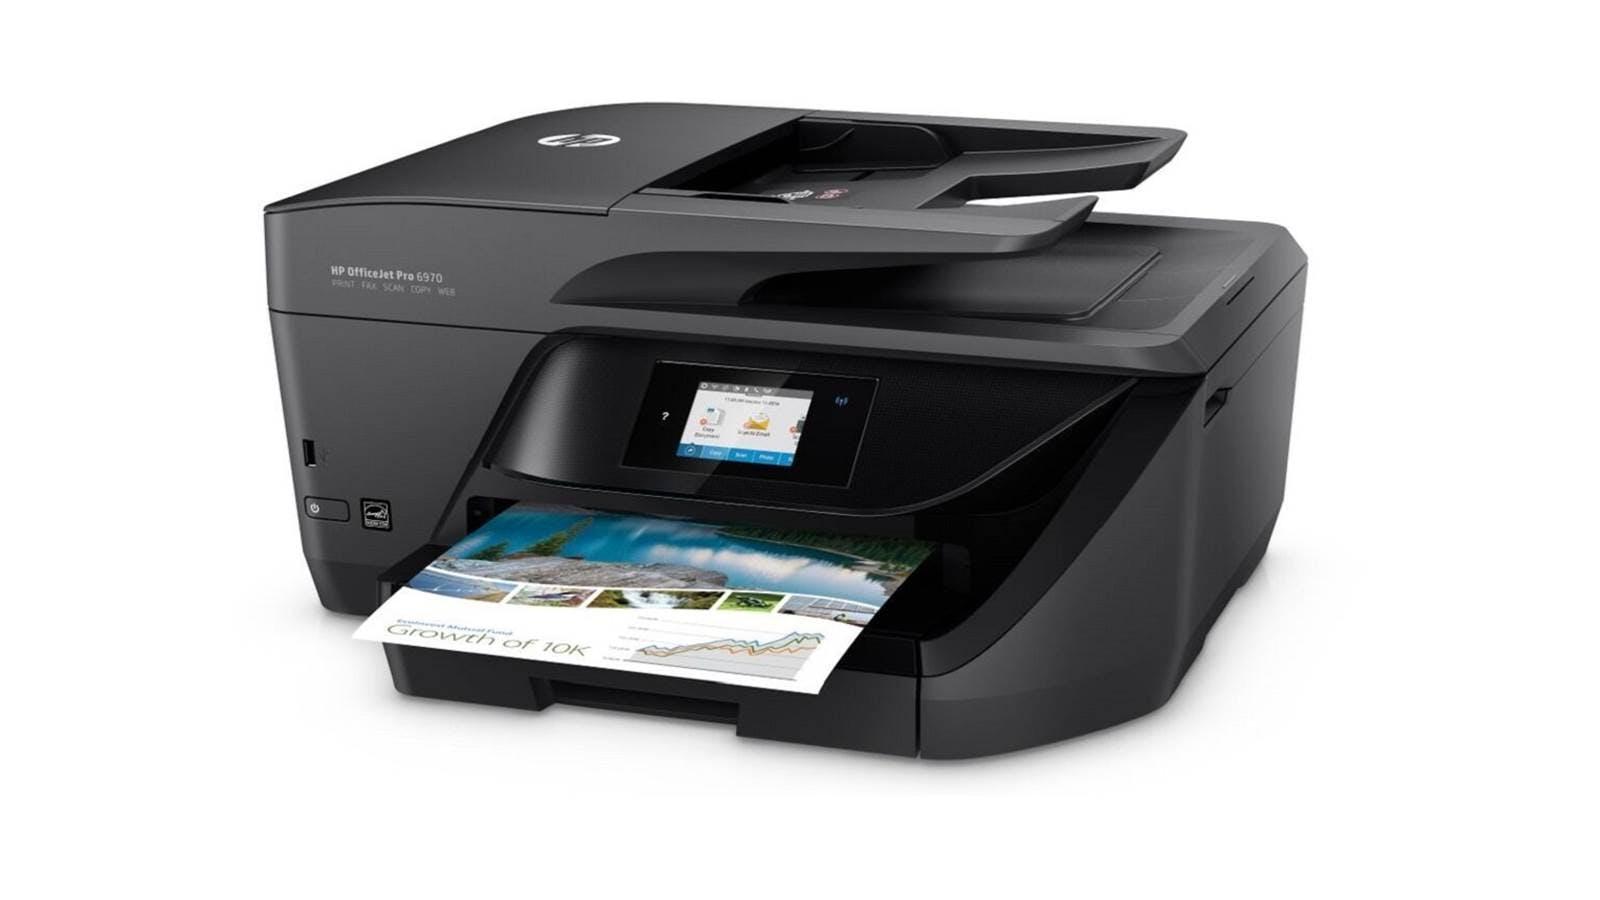 hp officejet pro 6970 all in one printer harvey norman. Black Bedroom Furniture Sets. Home Design Ideas